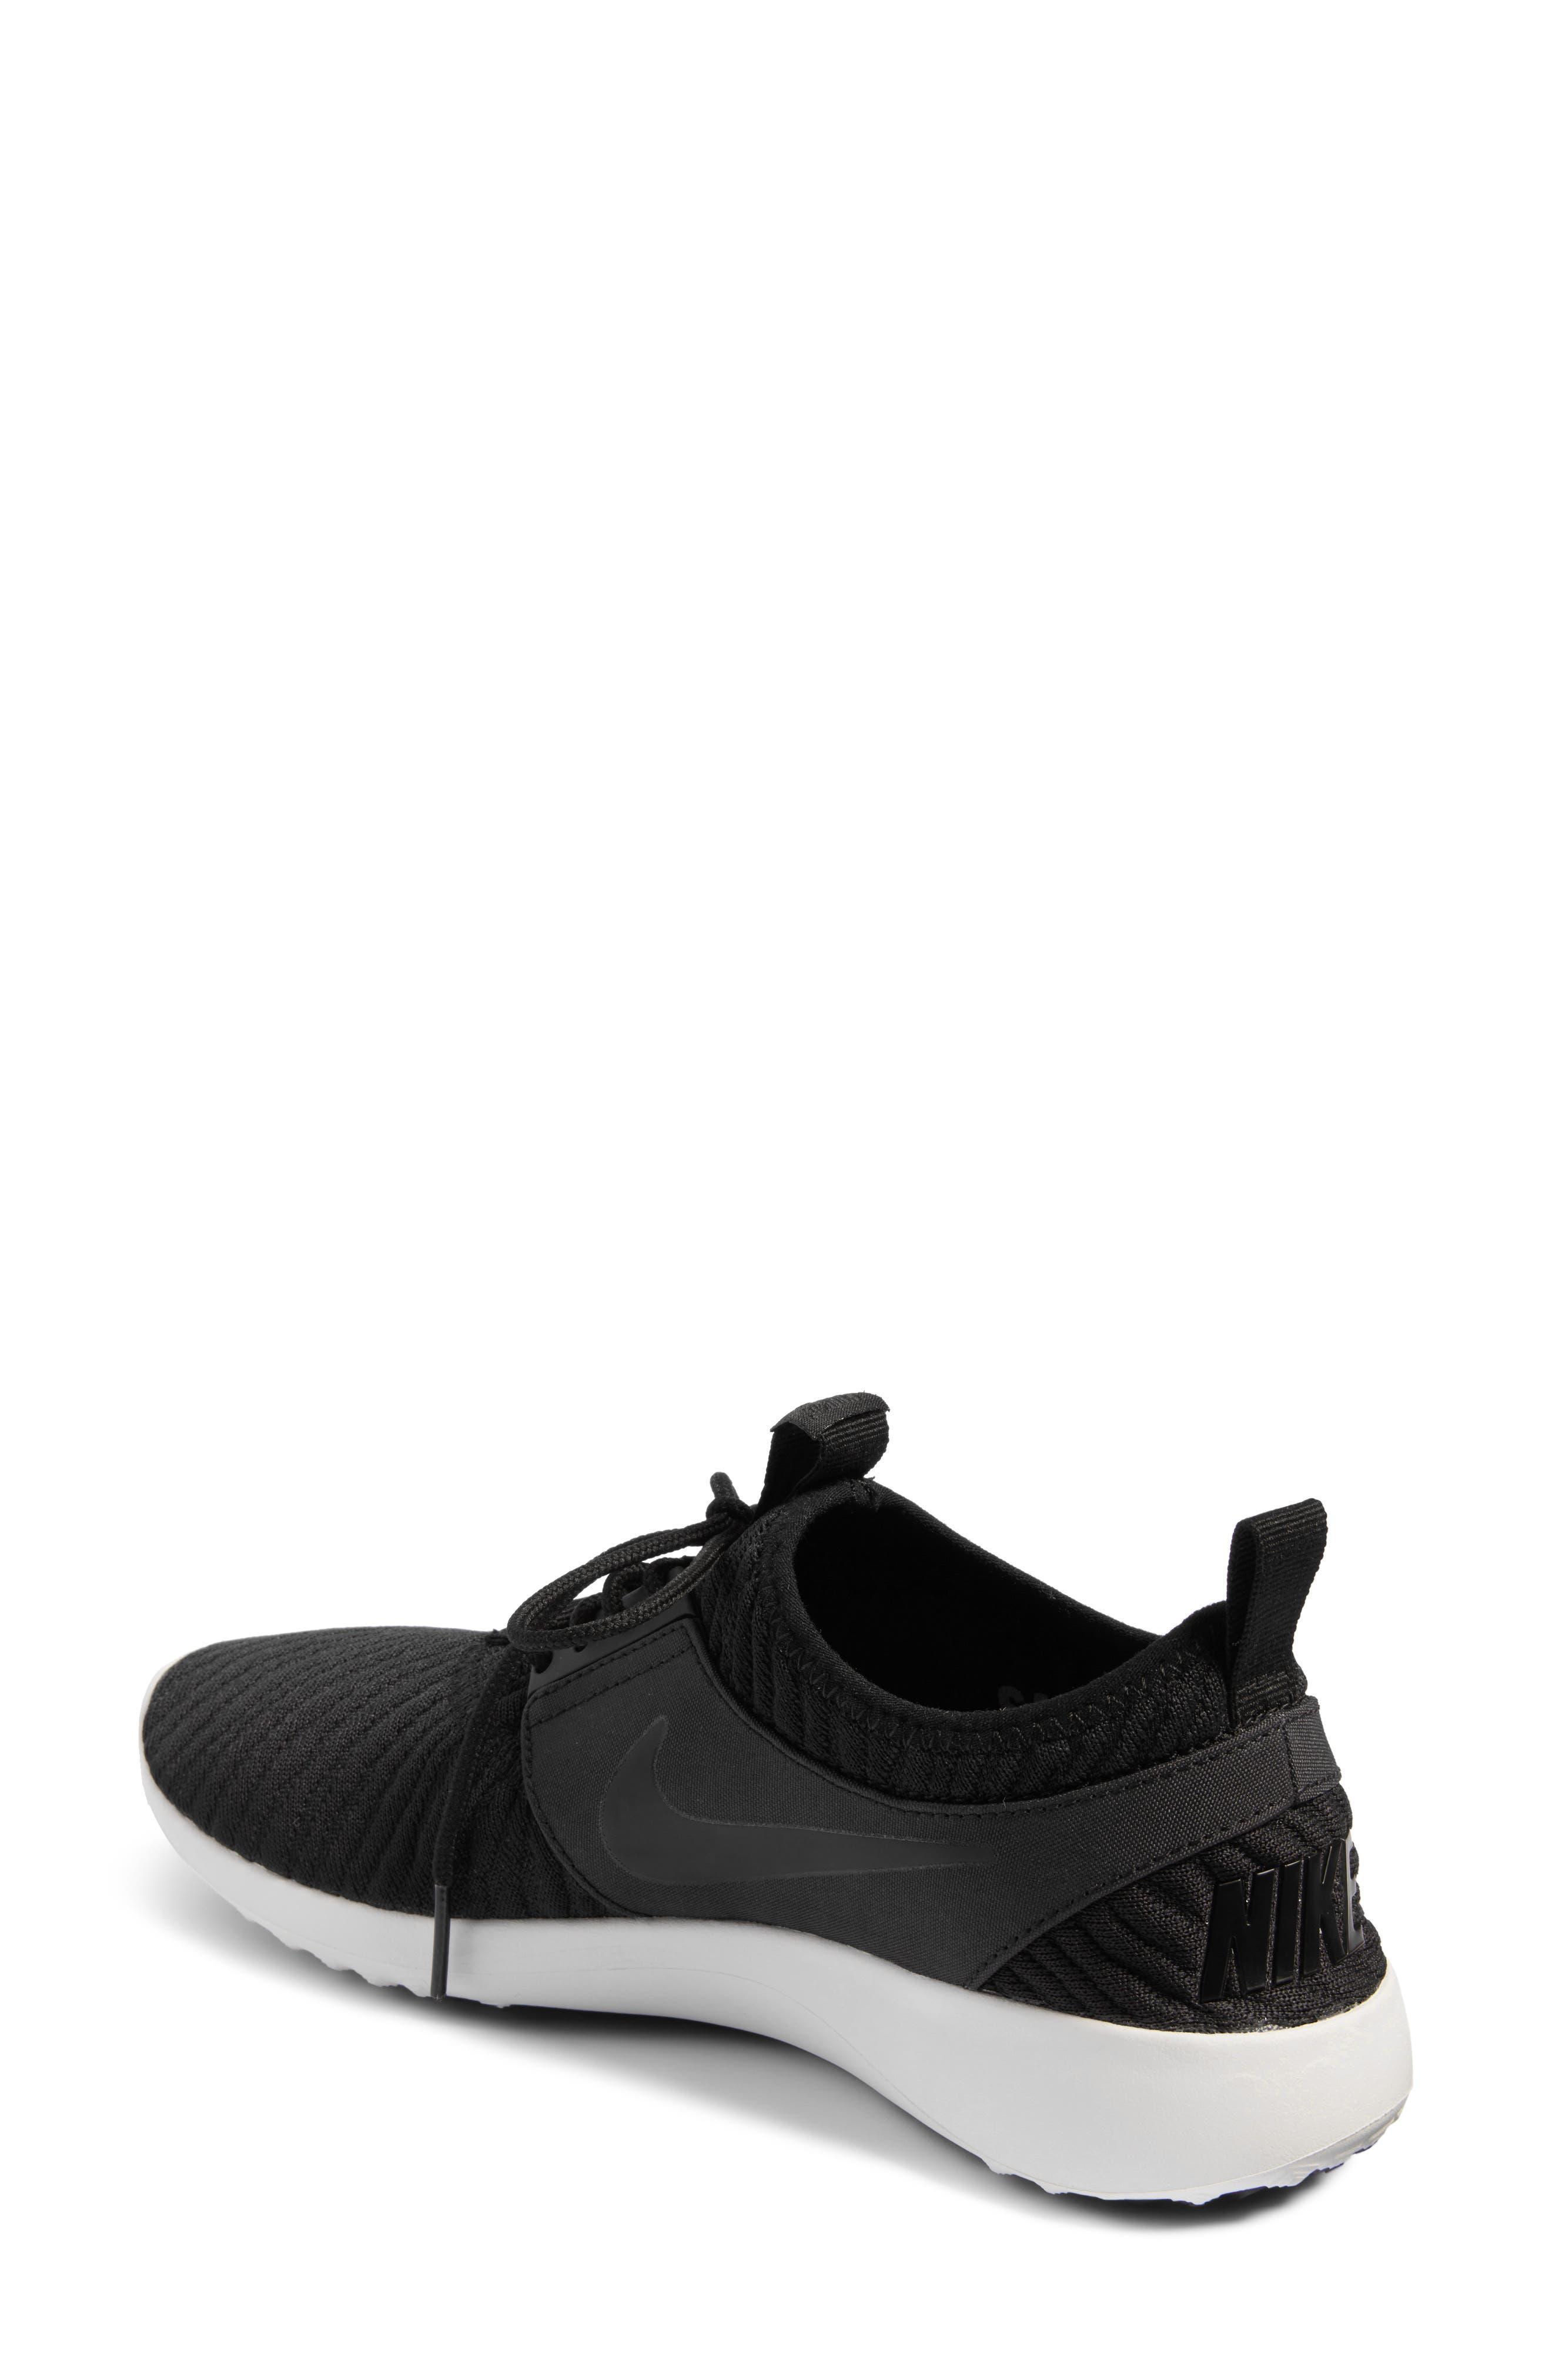 Juvenate SE Sneaker,                             Alternate thumbnail 19, color,